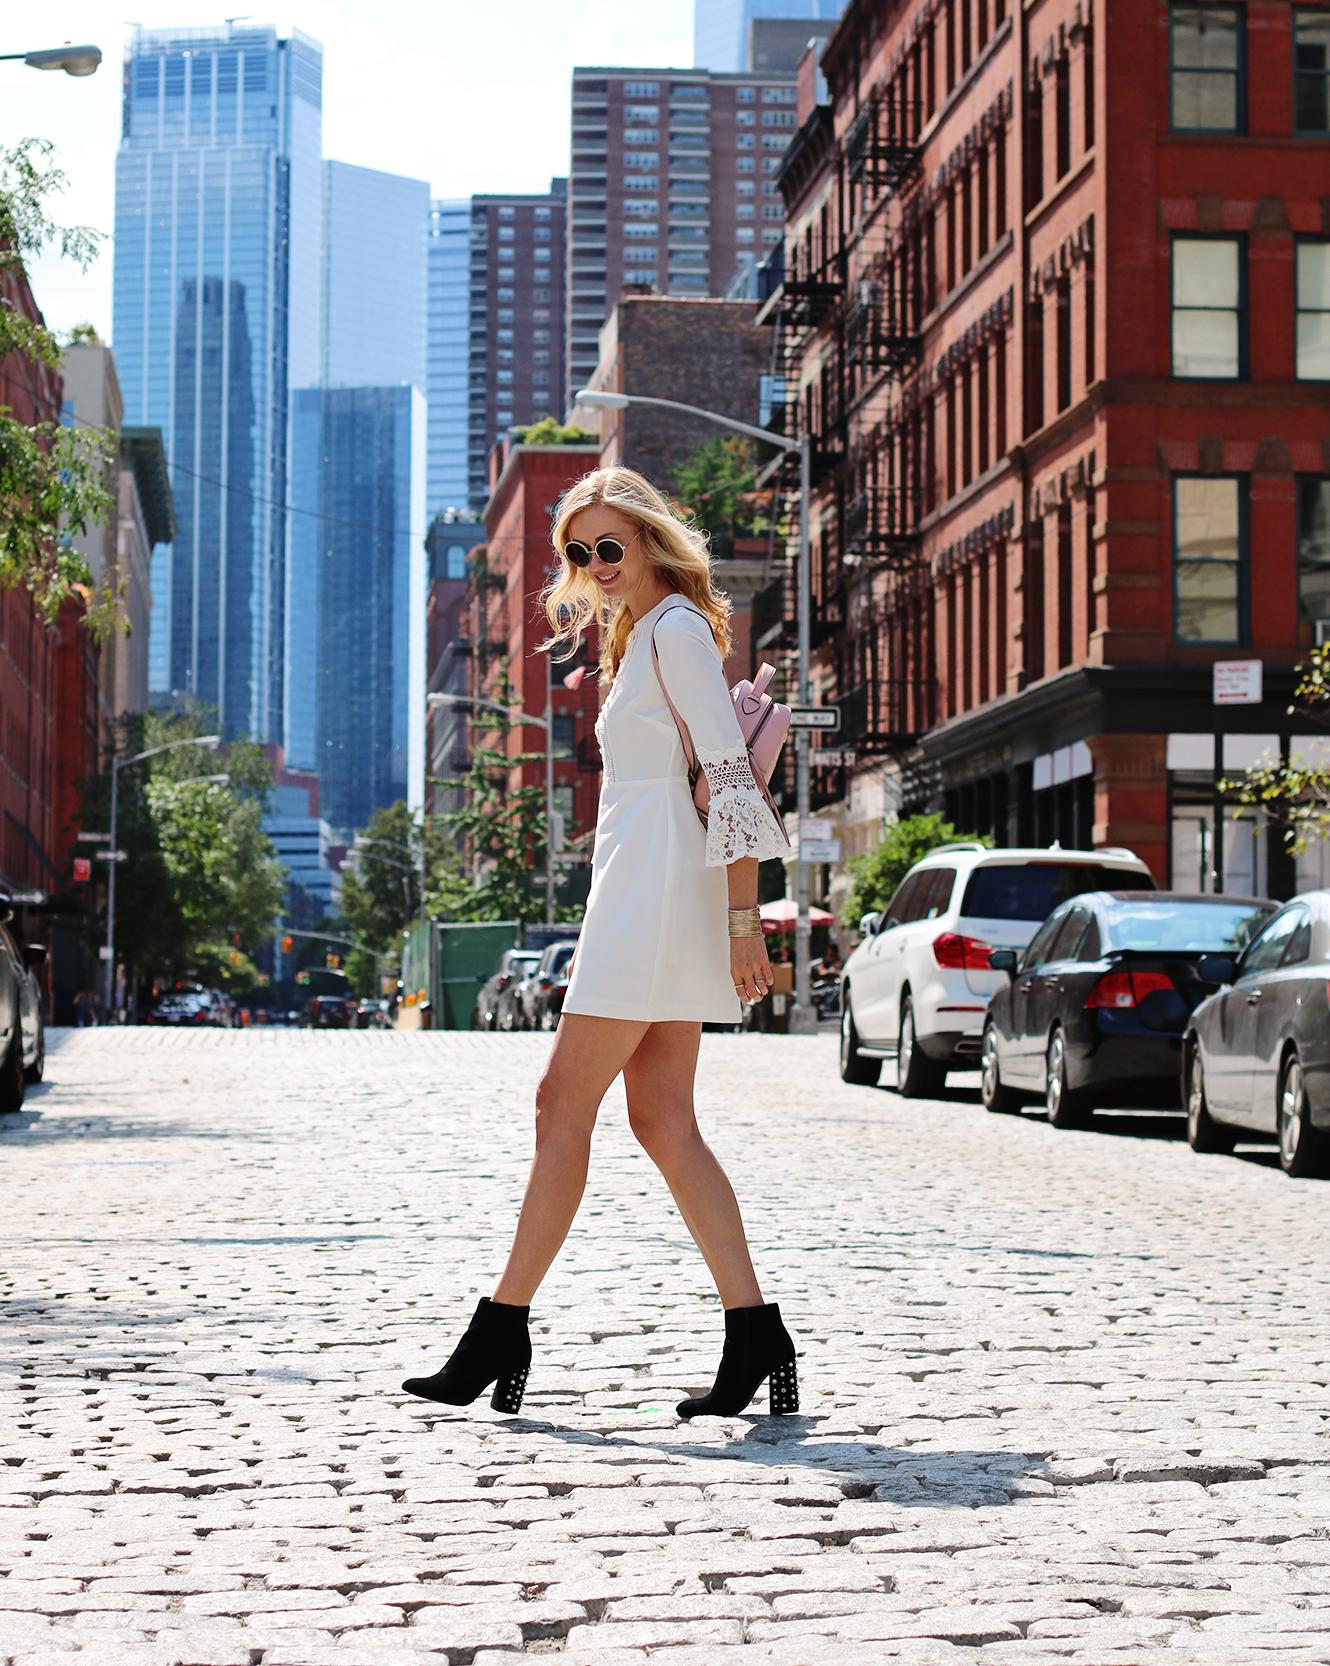 steve-madden-black-boots-wayf-dress-new-york-street-style.png